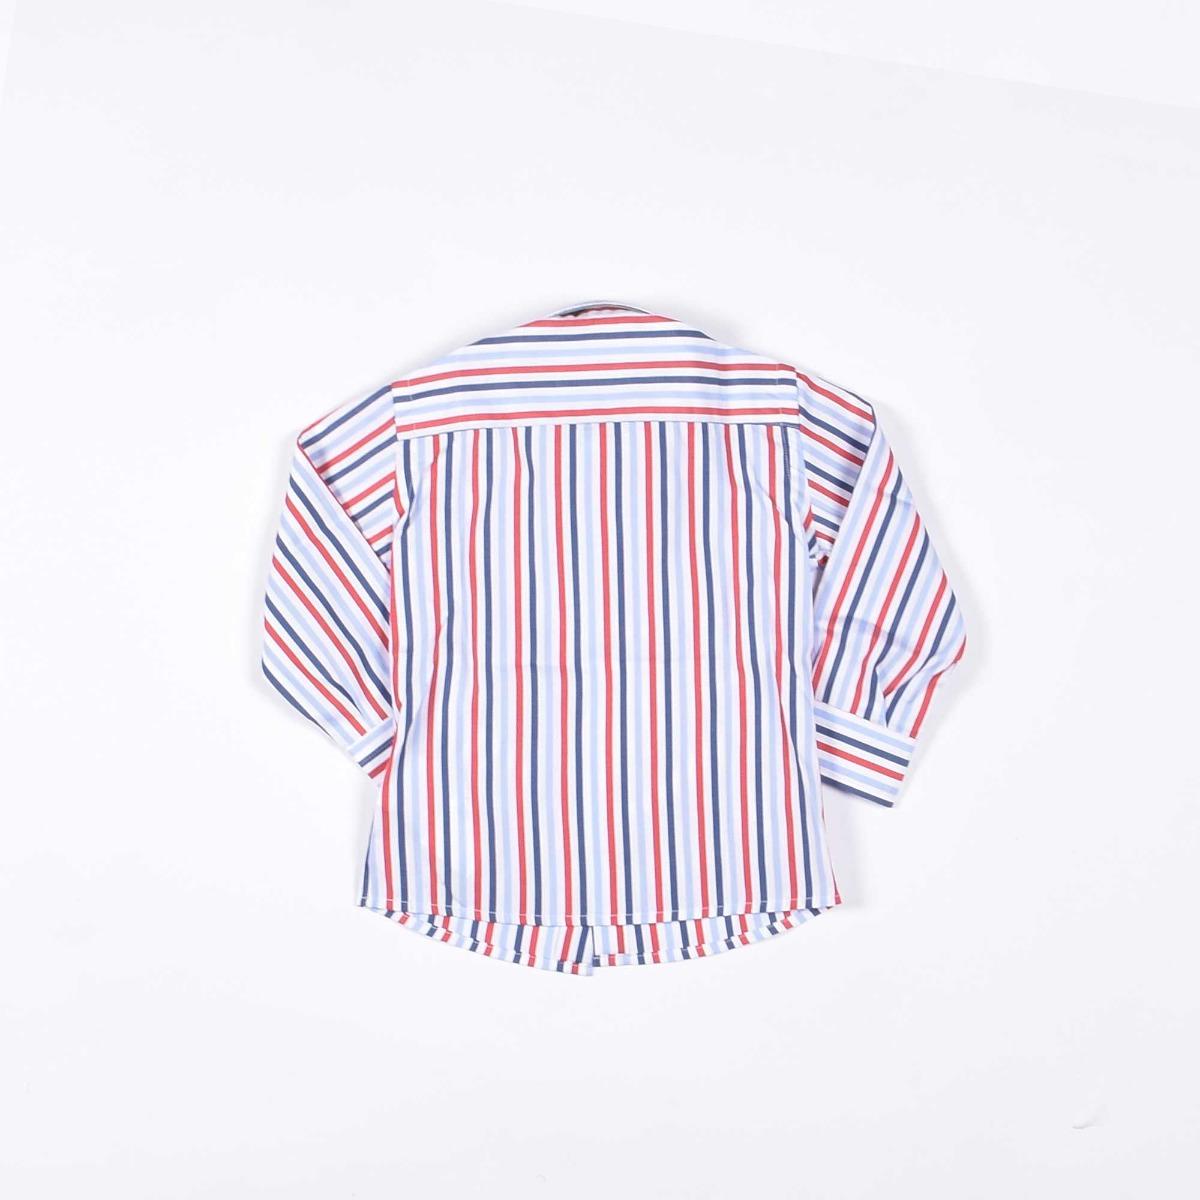 Camicia rigata - Bianca